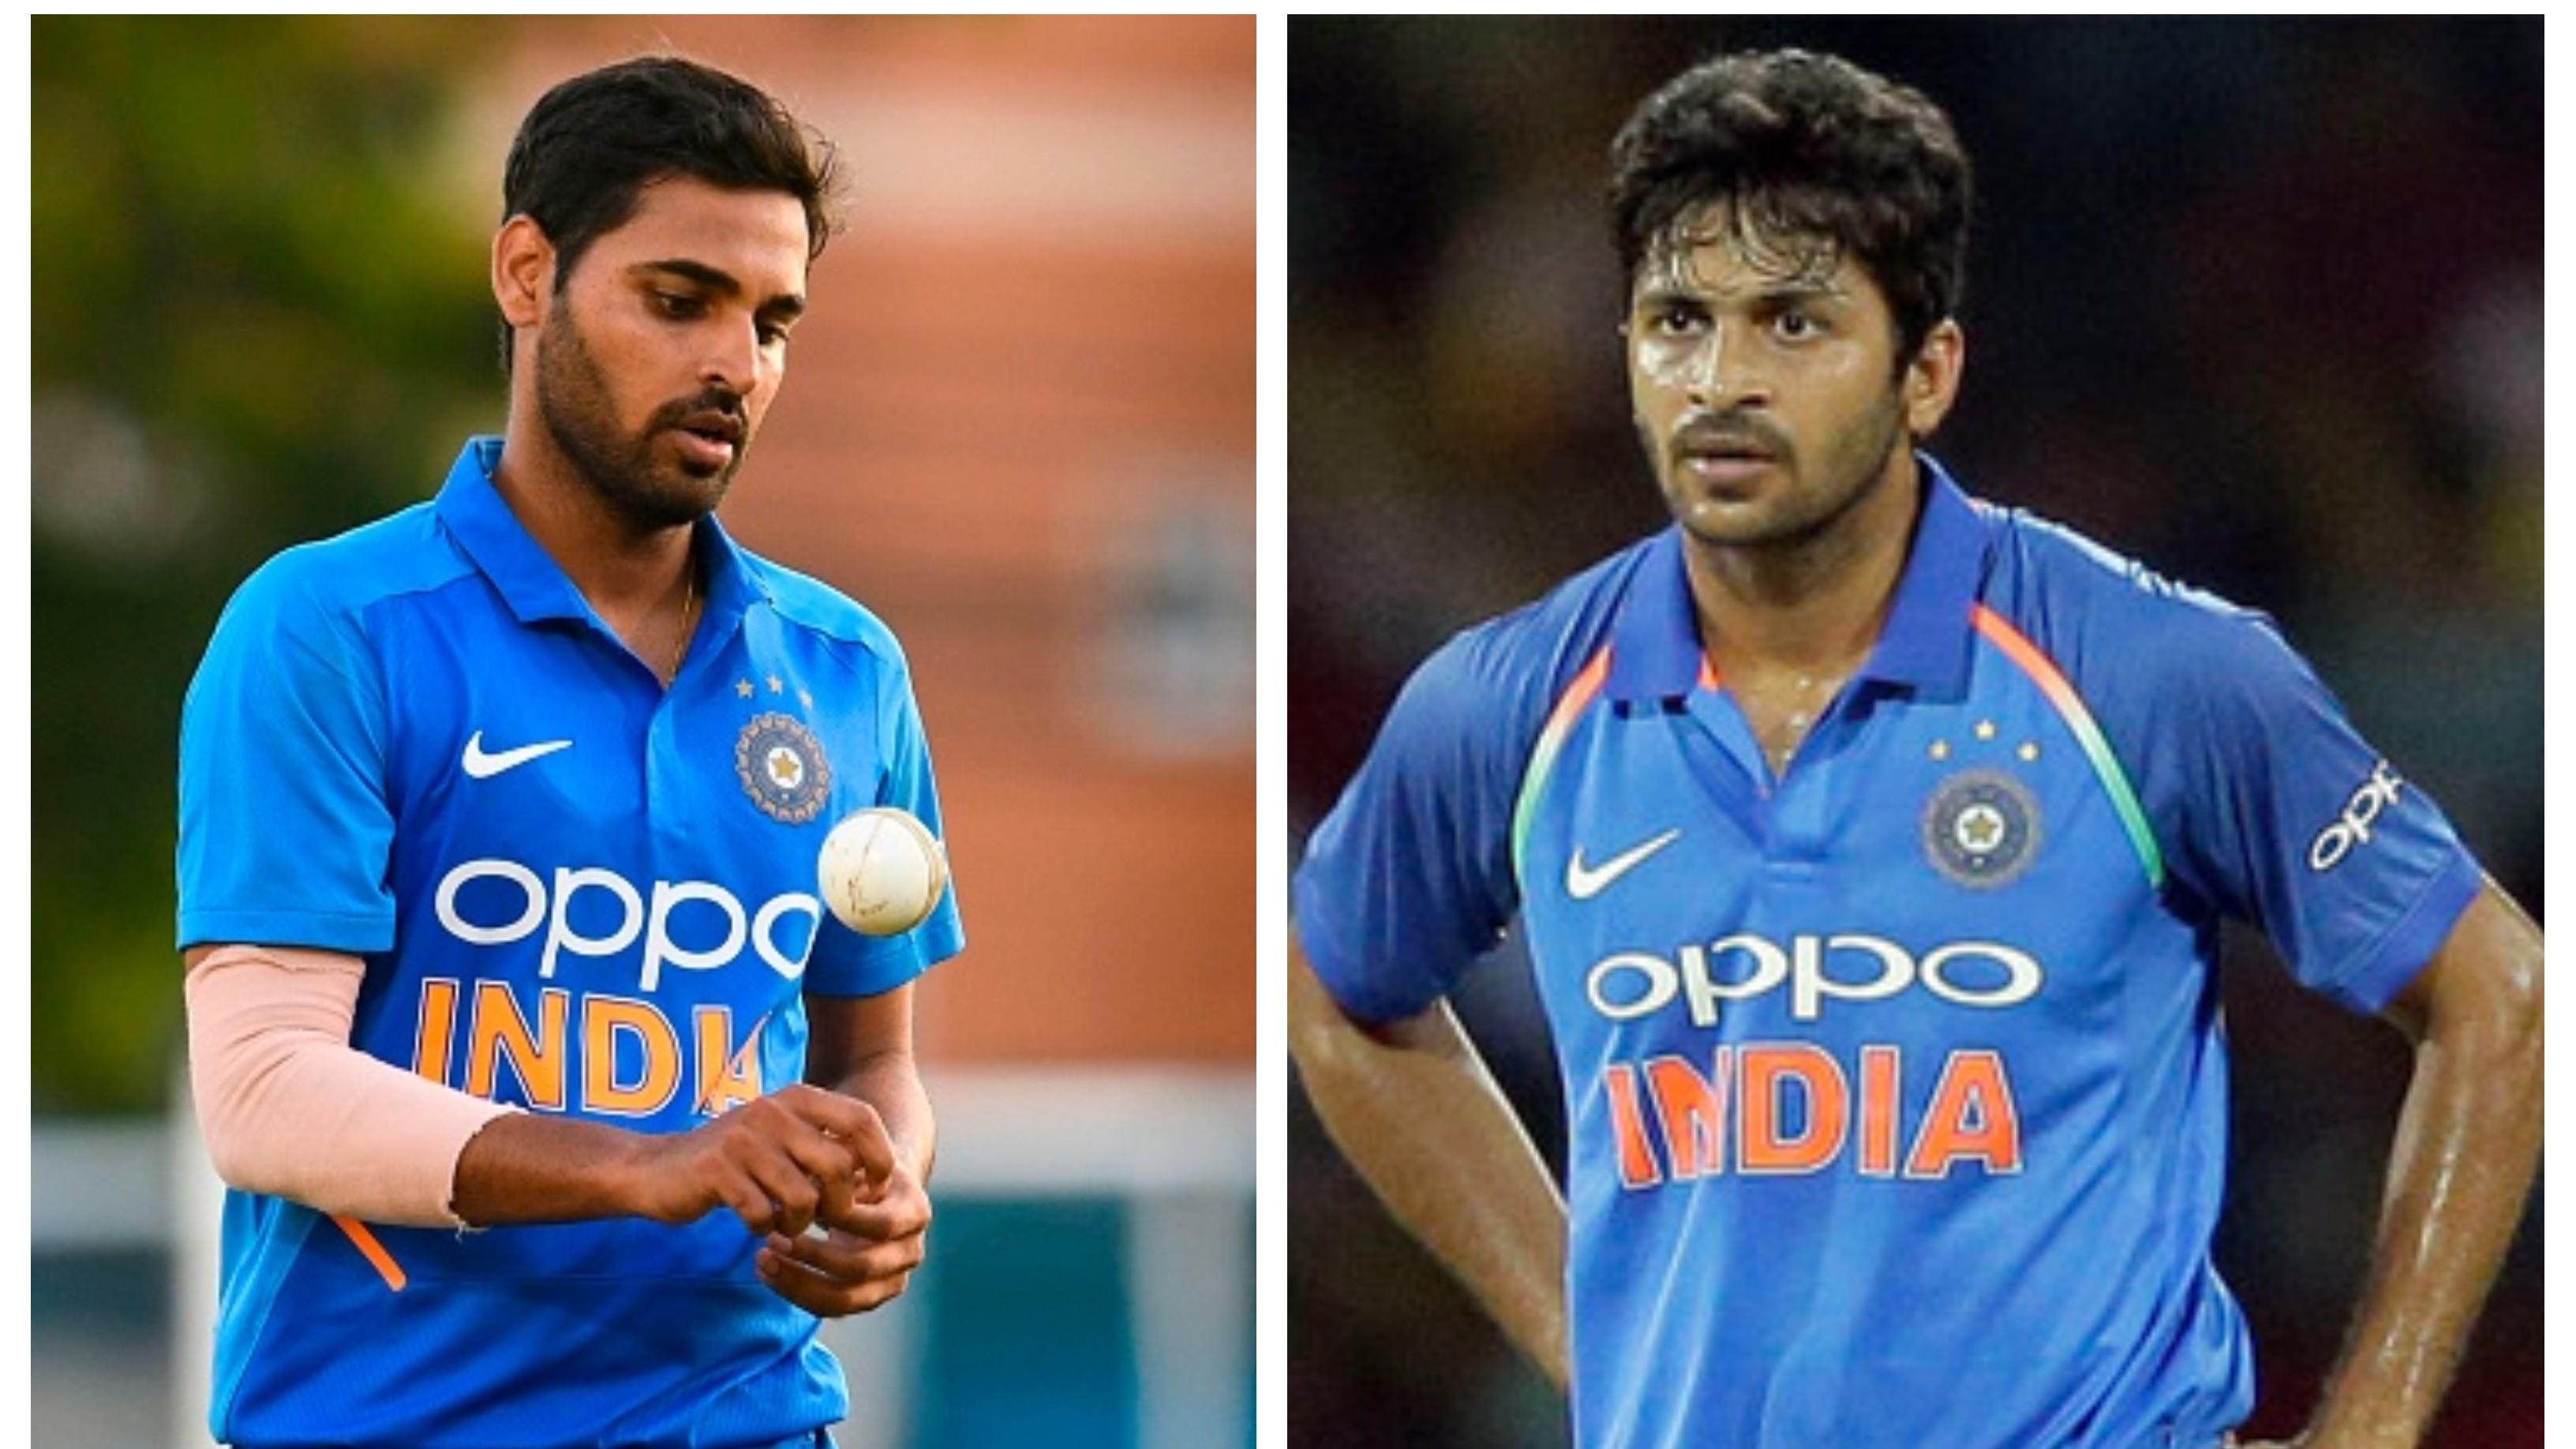 IND v WI 2019: Shardul Thakur replaces injured Bhuvneshwar Kumar for ODI series